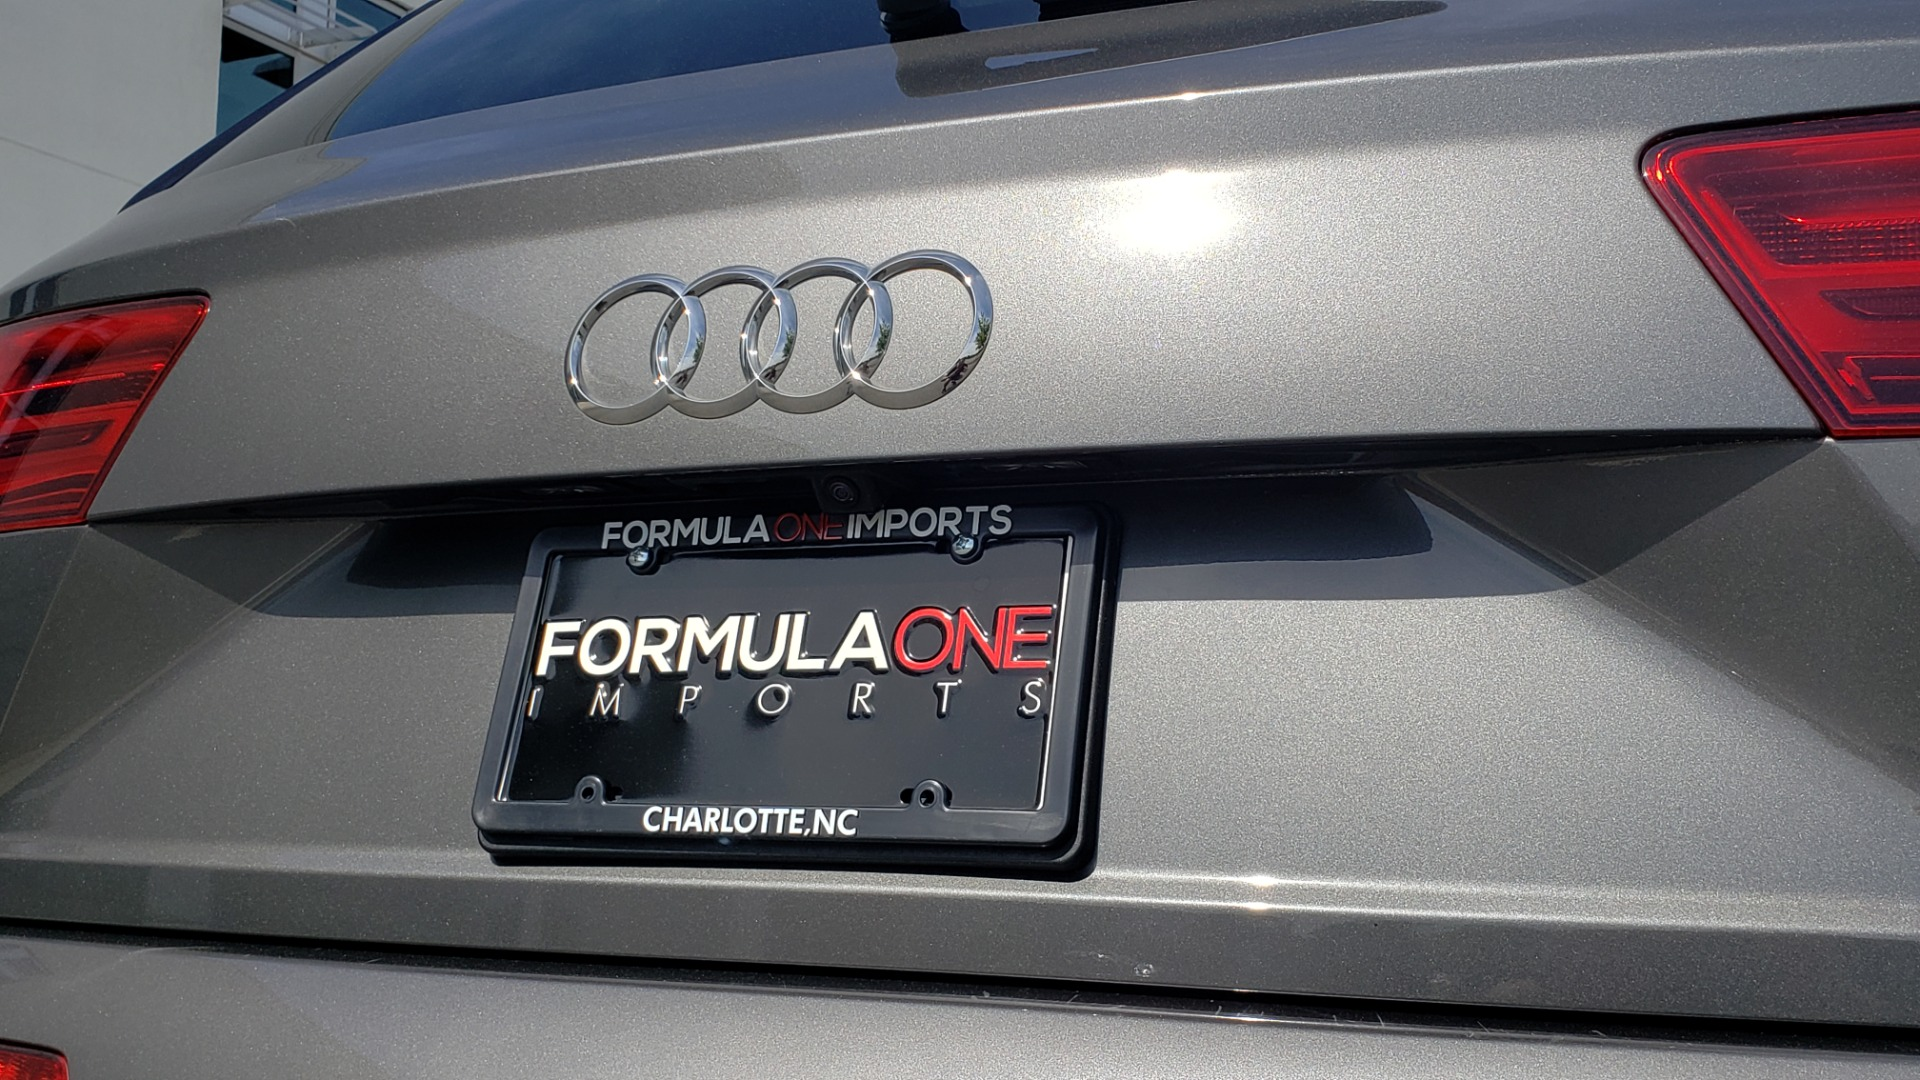 Used 2018 Audi Q7 PRESTIGE TIPTRONIC / NAV / SUNROOF / ADAPTIVE PKG / DRVR ASST / CLD WTHR /  for sale $49,995 at Formula Imports in Charlotte NC 28227 29